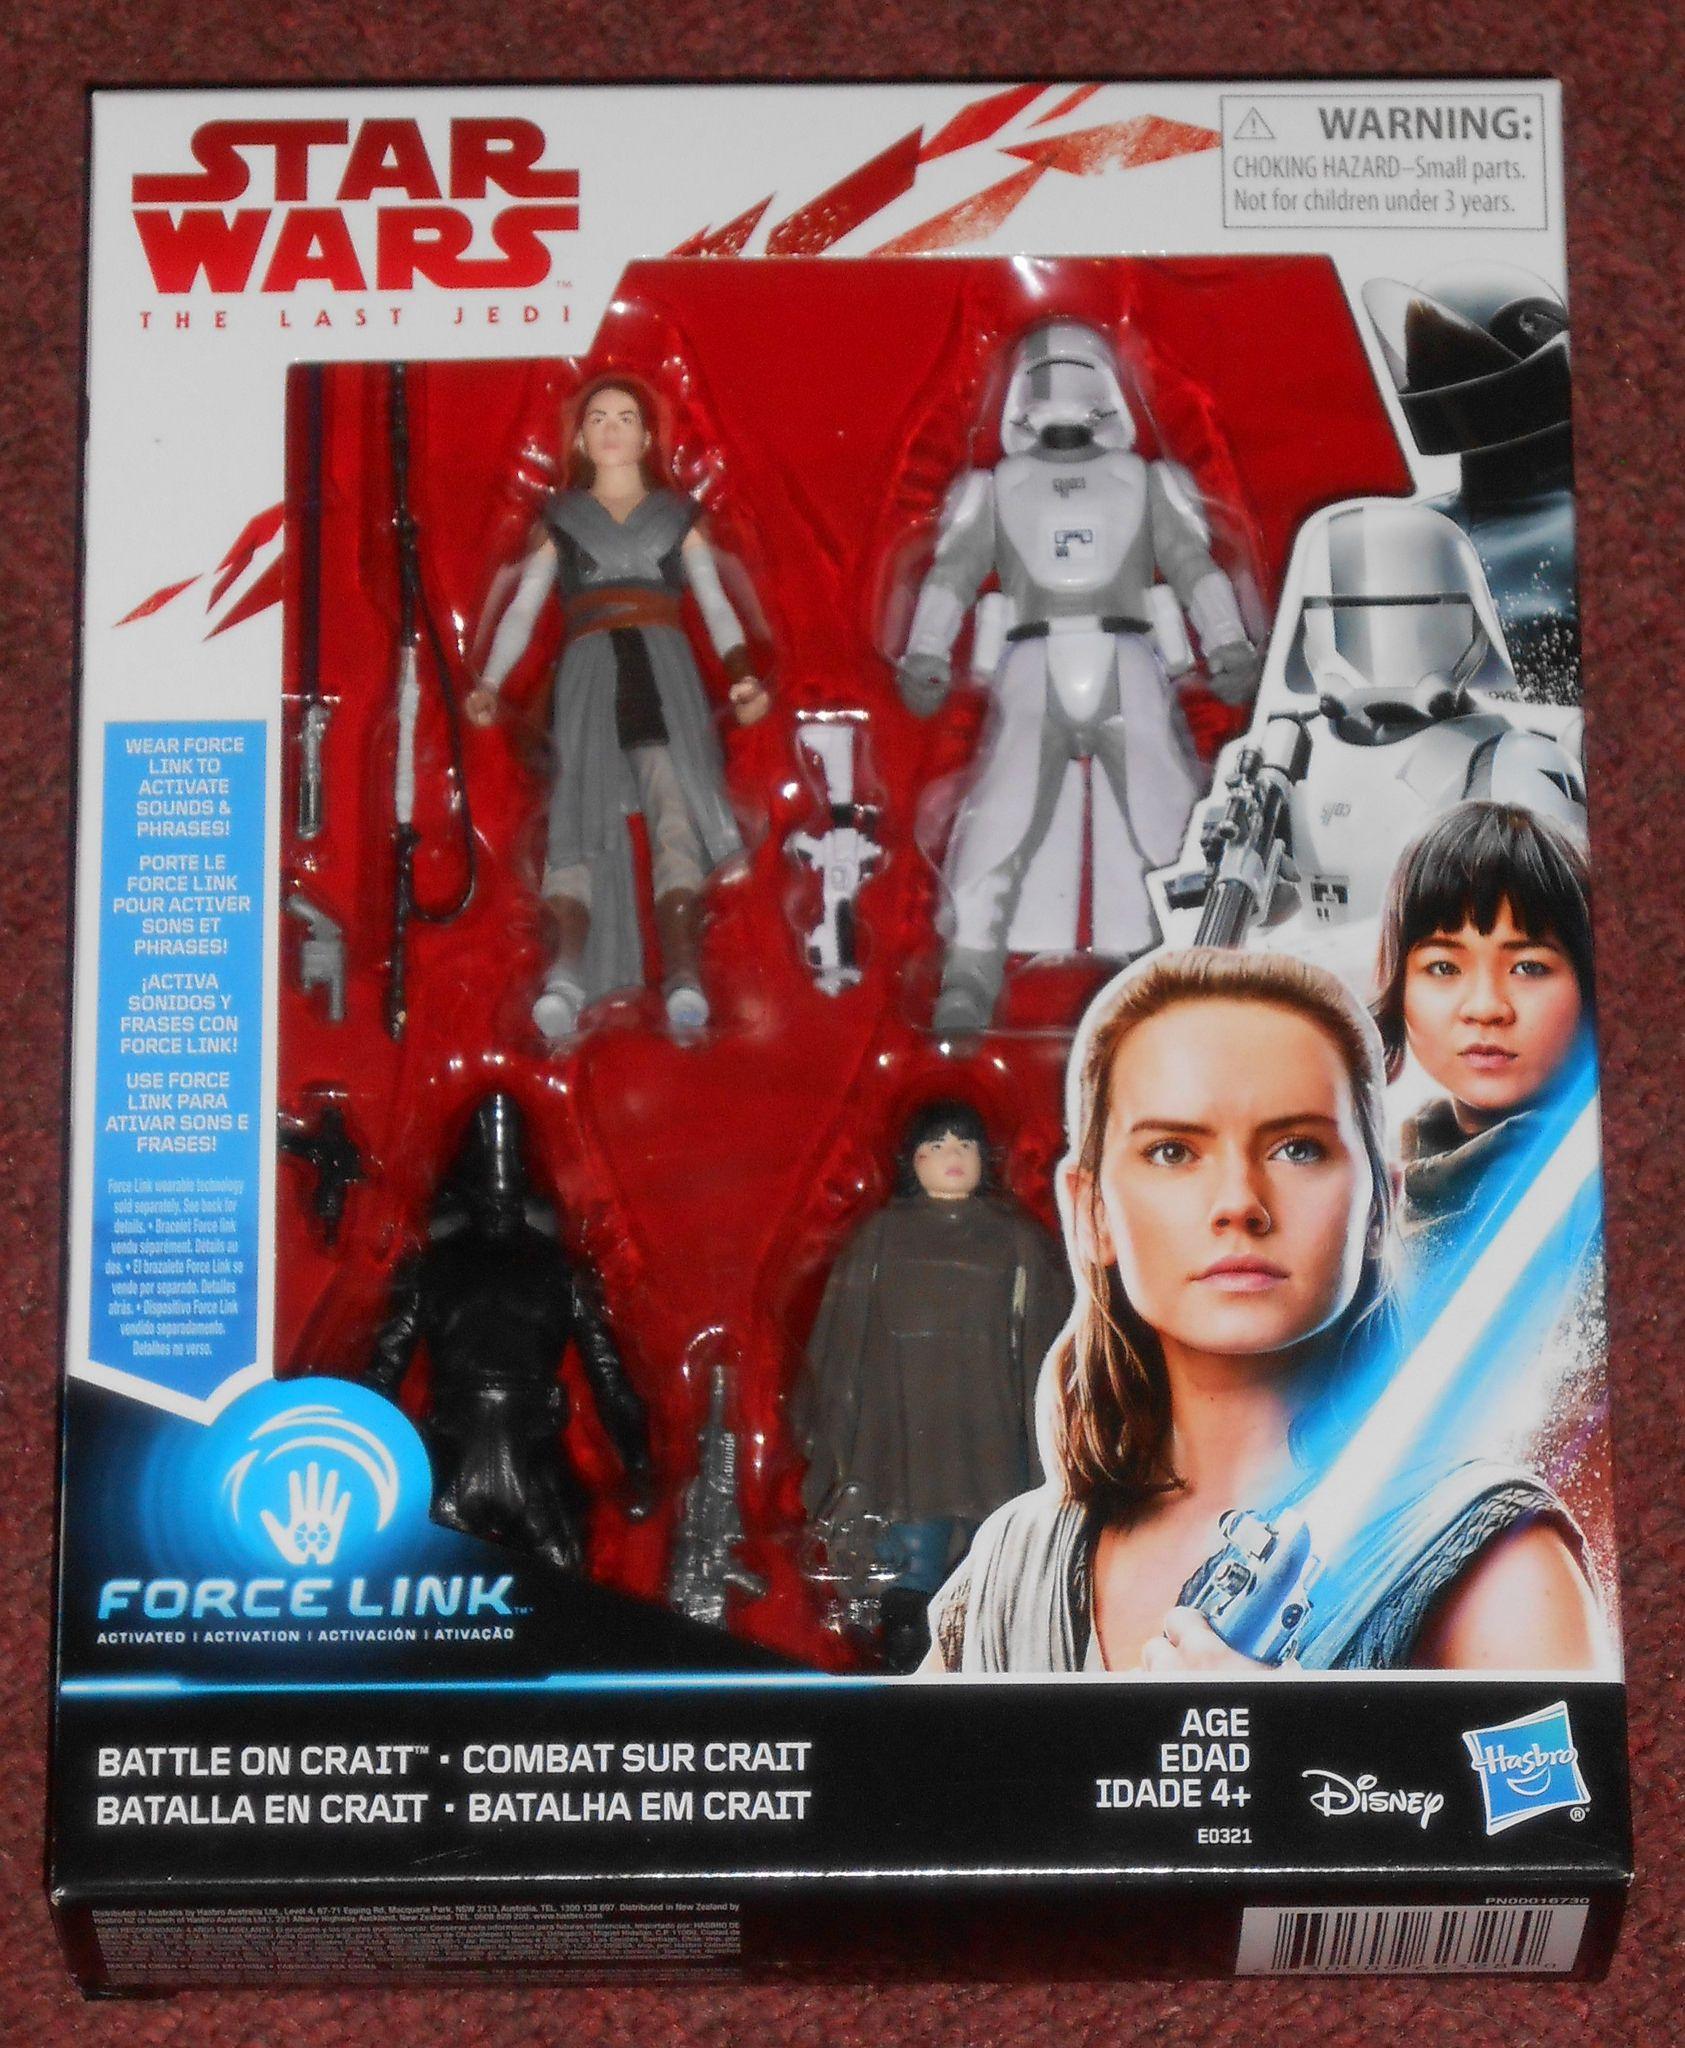 STAR WARS the Last Jedi Force Link 4 Battle pack action figures